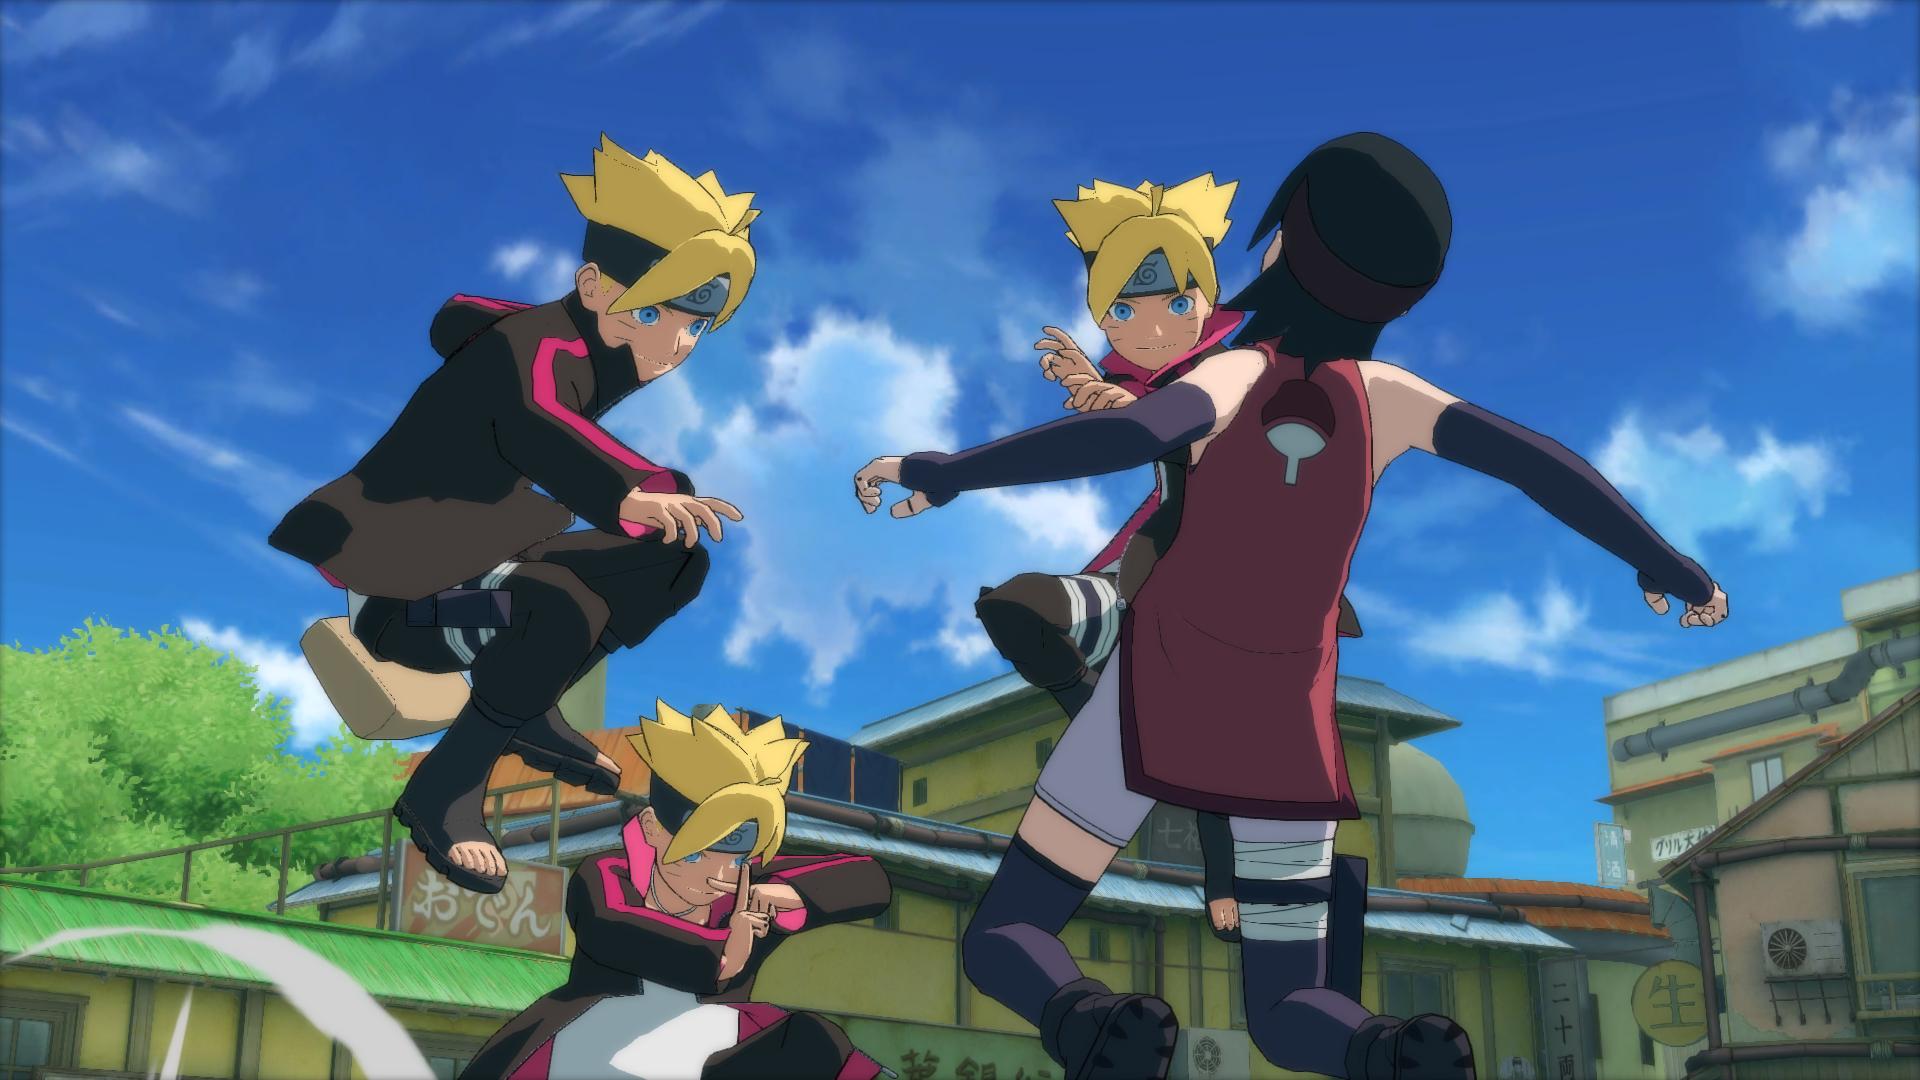 Naruto Shippuden Ultimate Ninja Storm 4 DLC and Season Pass detailed